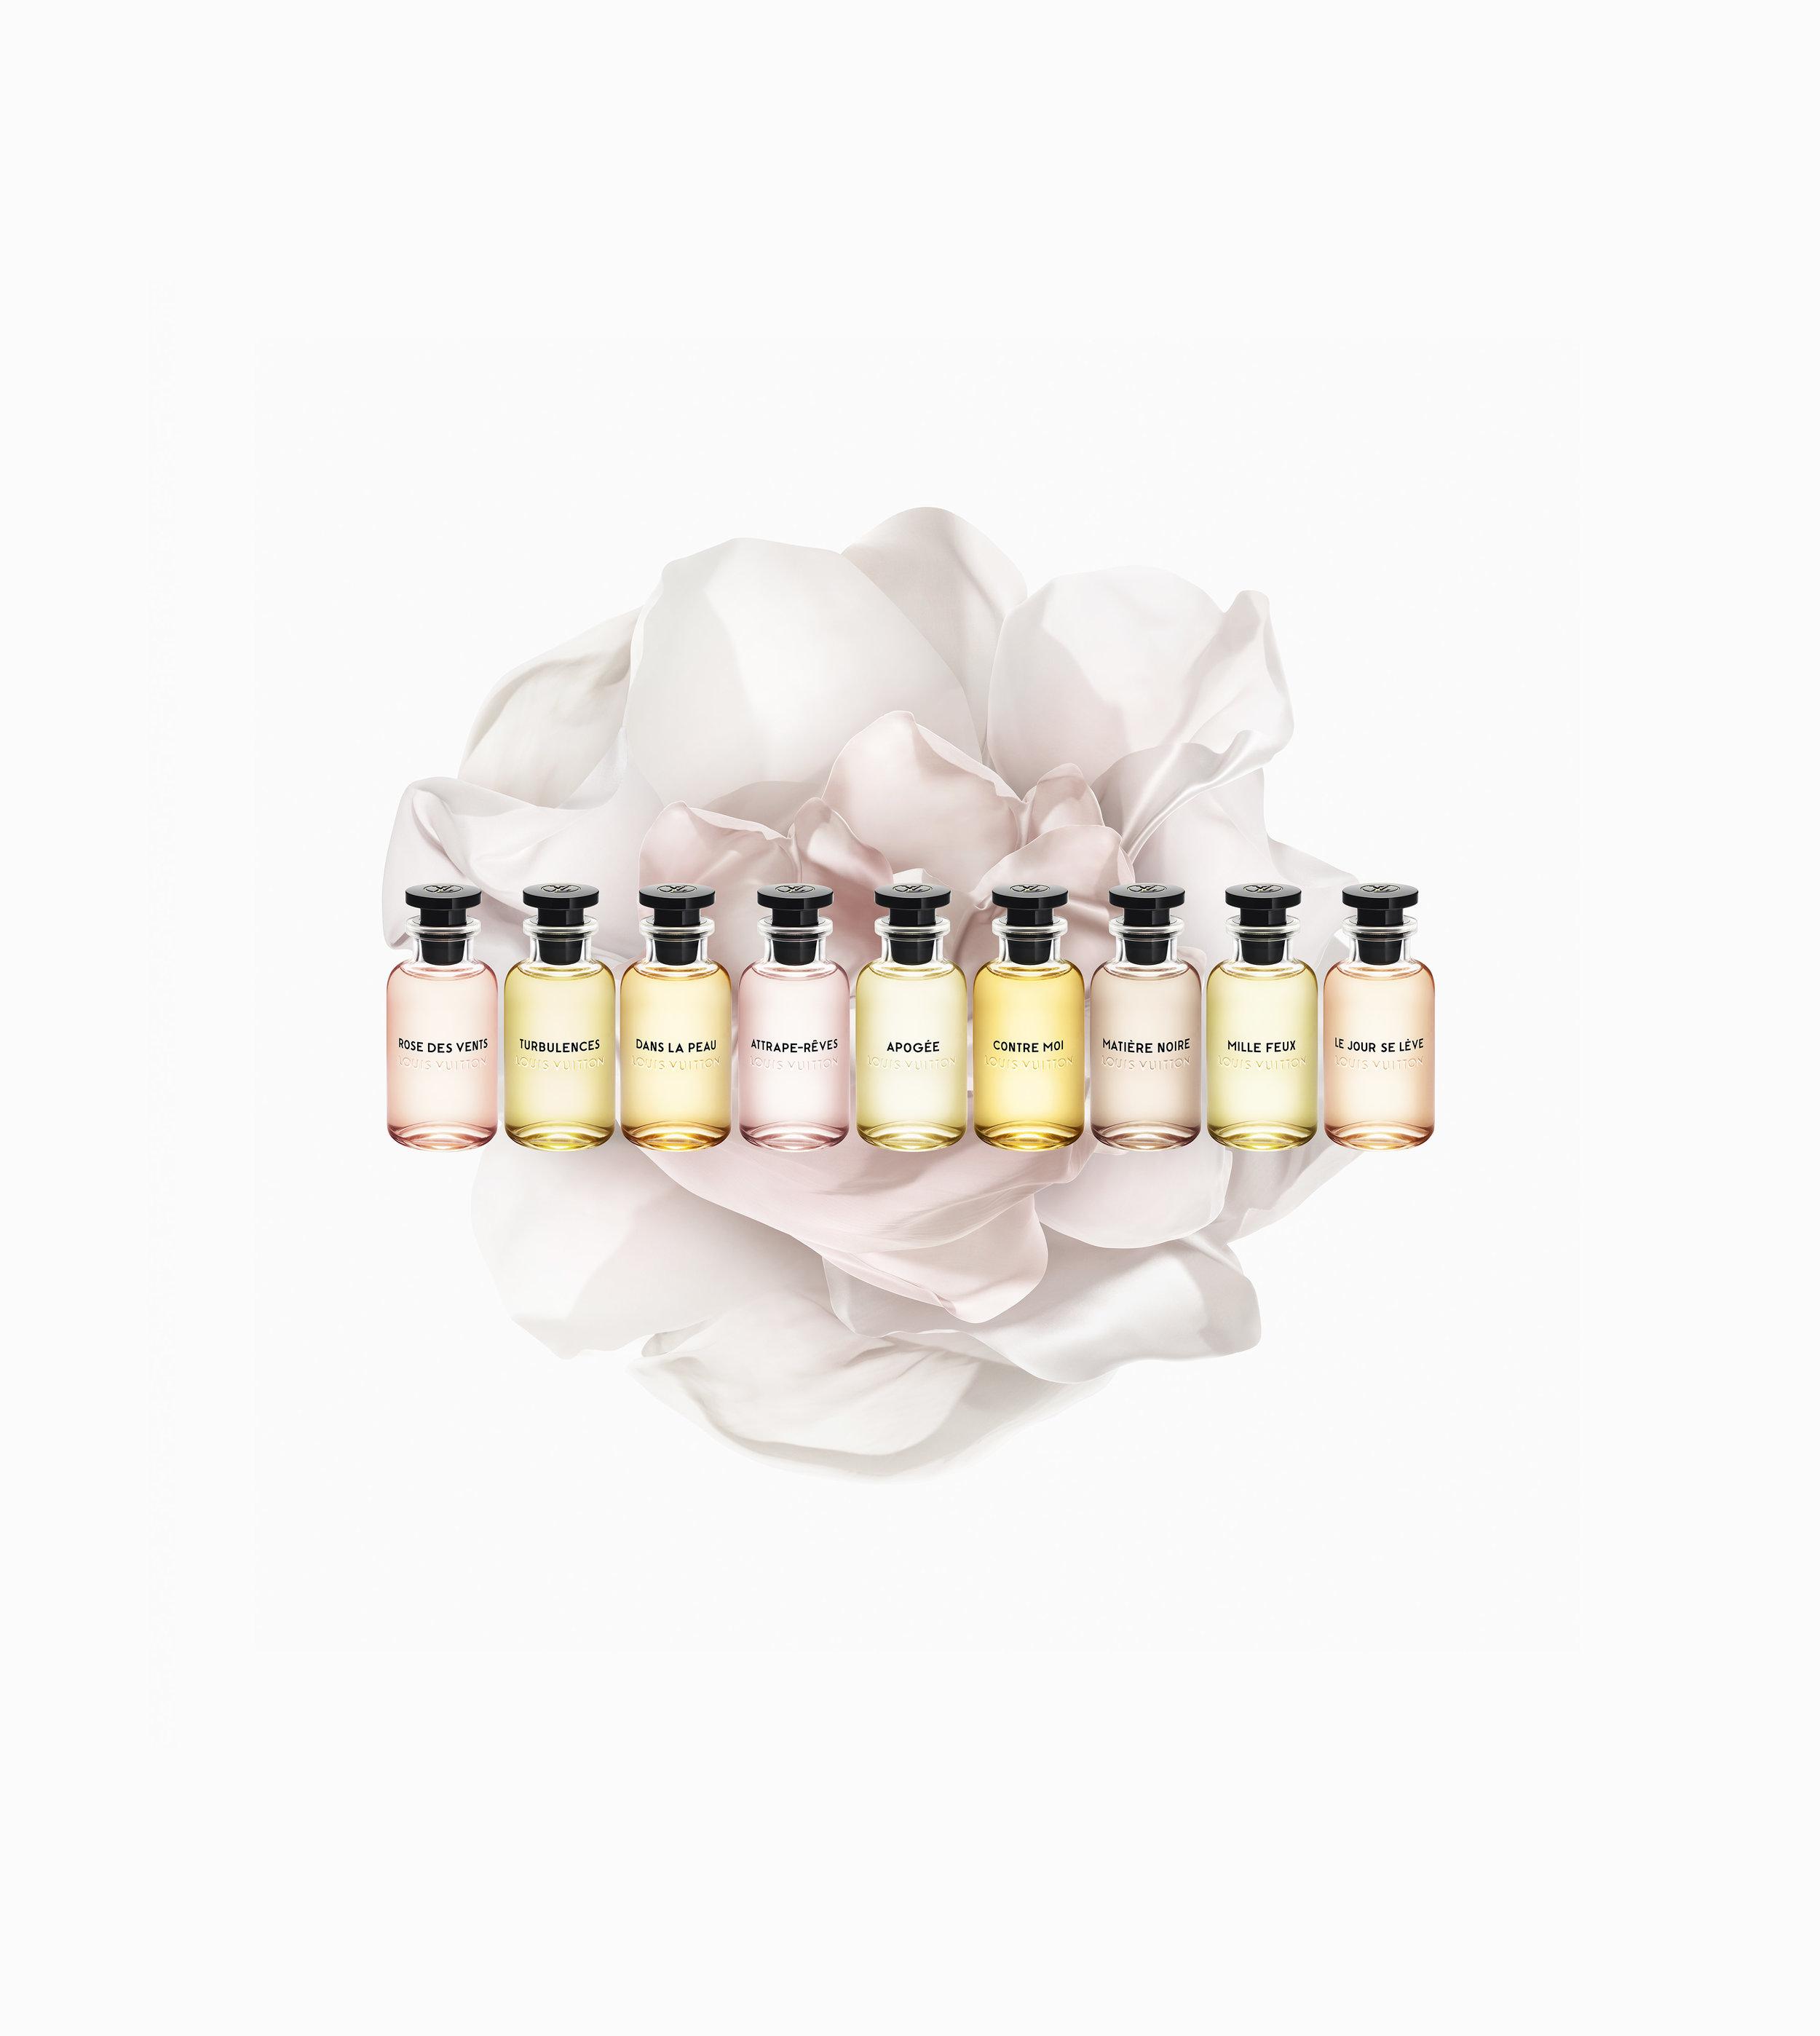 LV-MothersDay-COMP-Gamme2018-9parfums_RVB_w3b.jpg